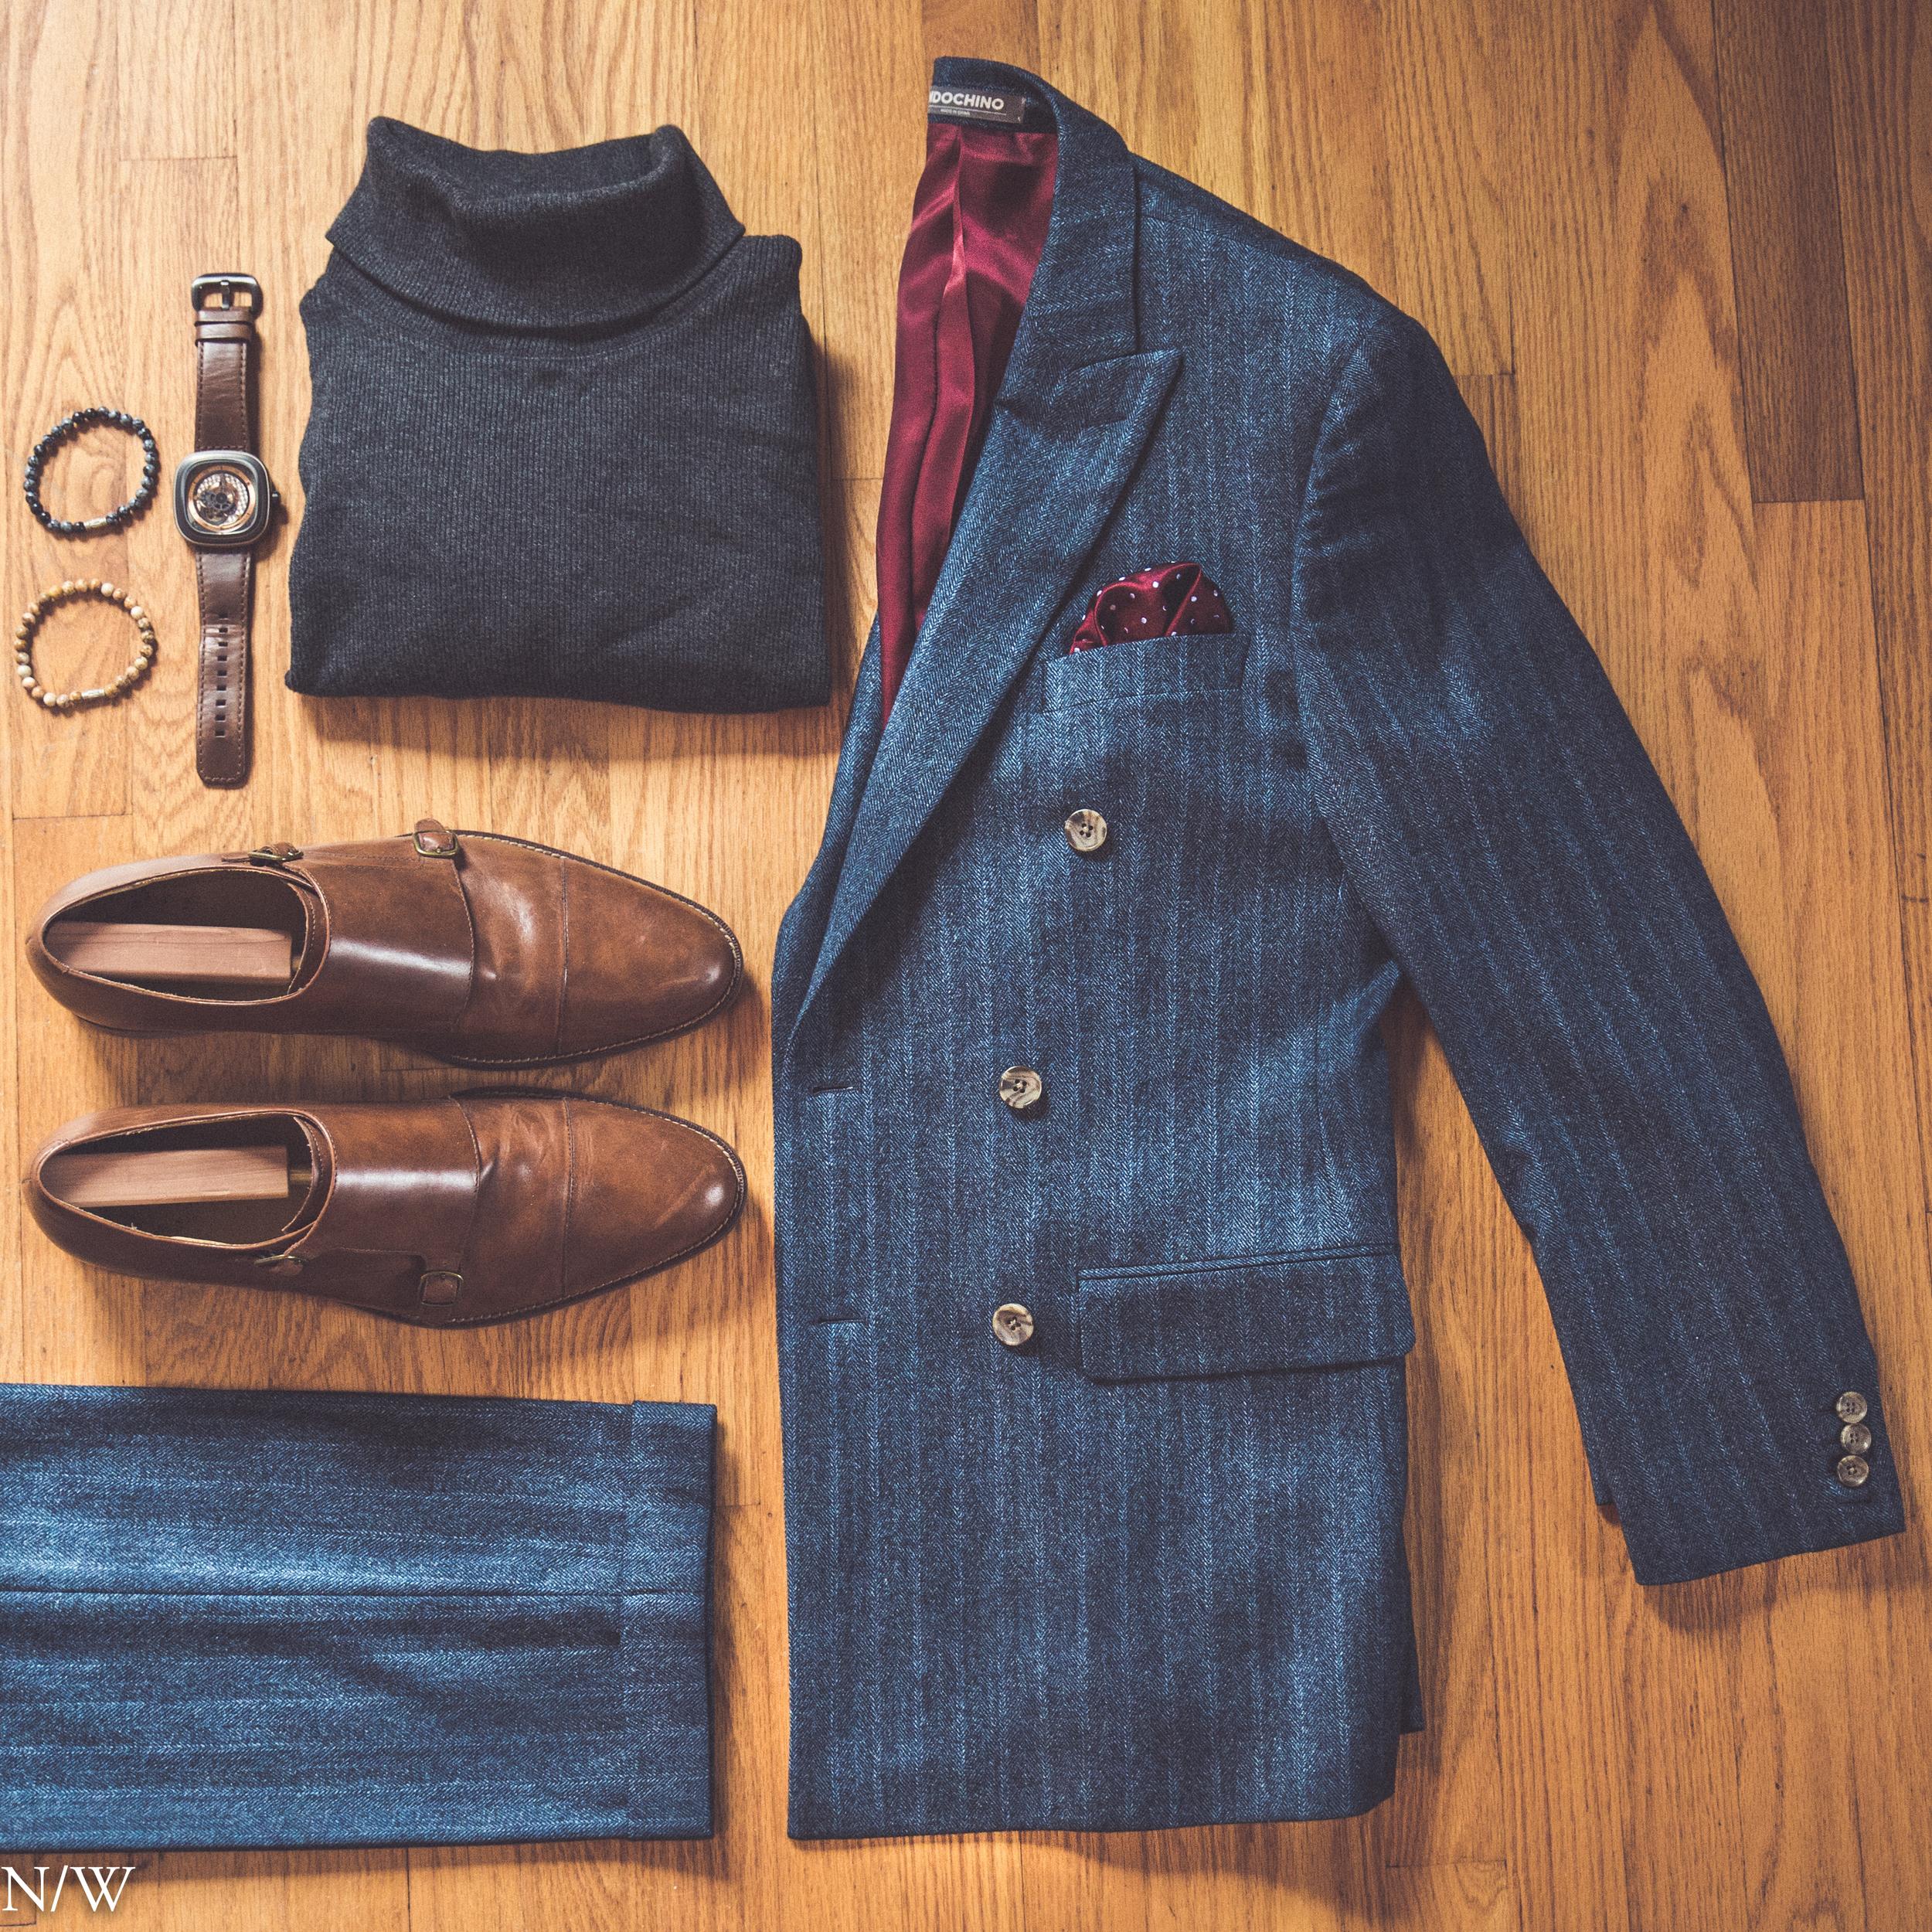 Suit: Indochino, Shoes: Cole Haan, Sweater: Ralph Lauren, Watch: Seven Friday, Bracelets: Our Saints, Pocket Square: Bows-n-ties.com.